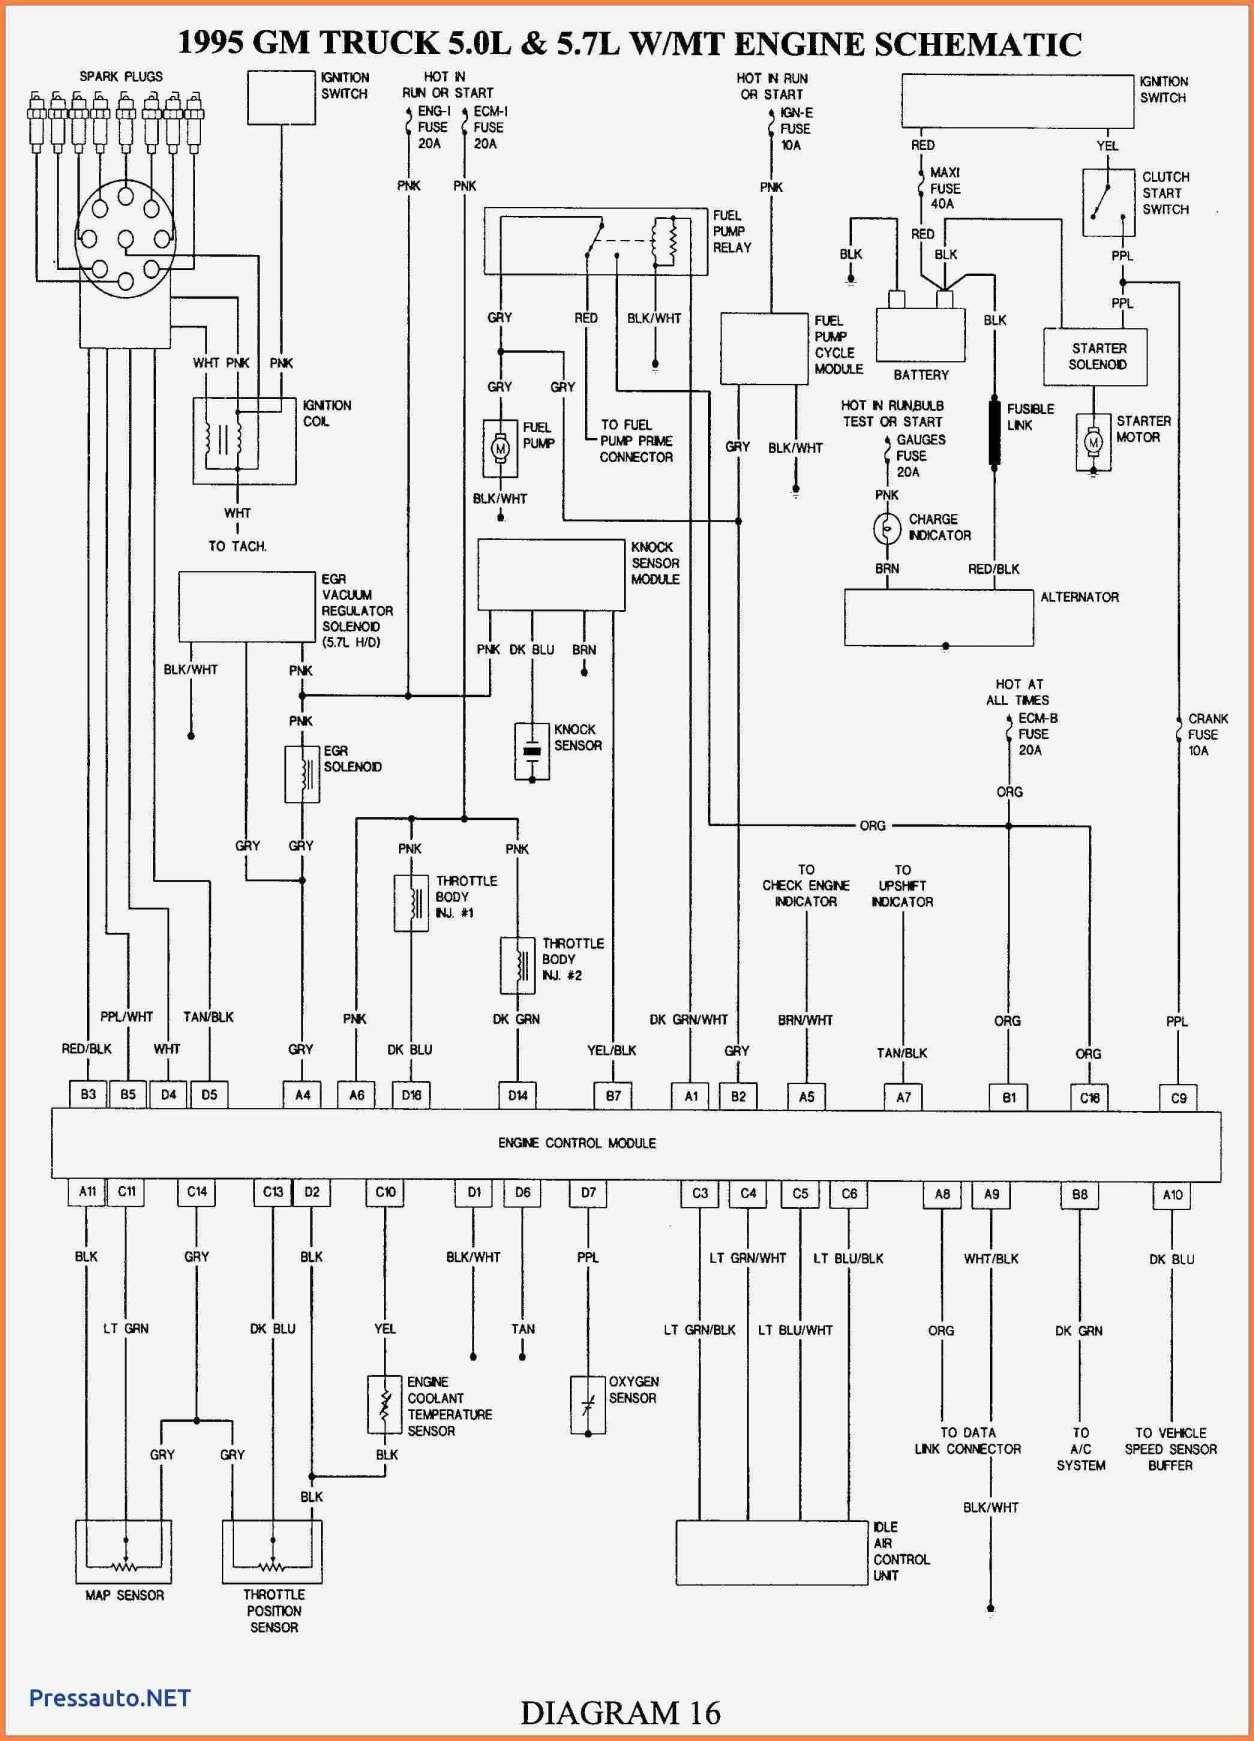 2003 Chevy Alternator Wiring Diagram